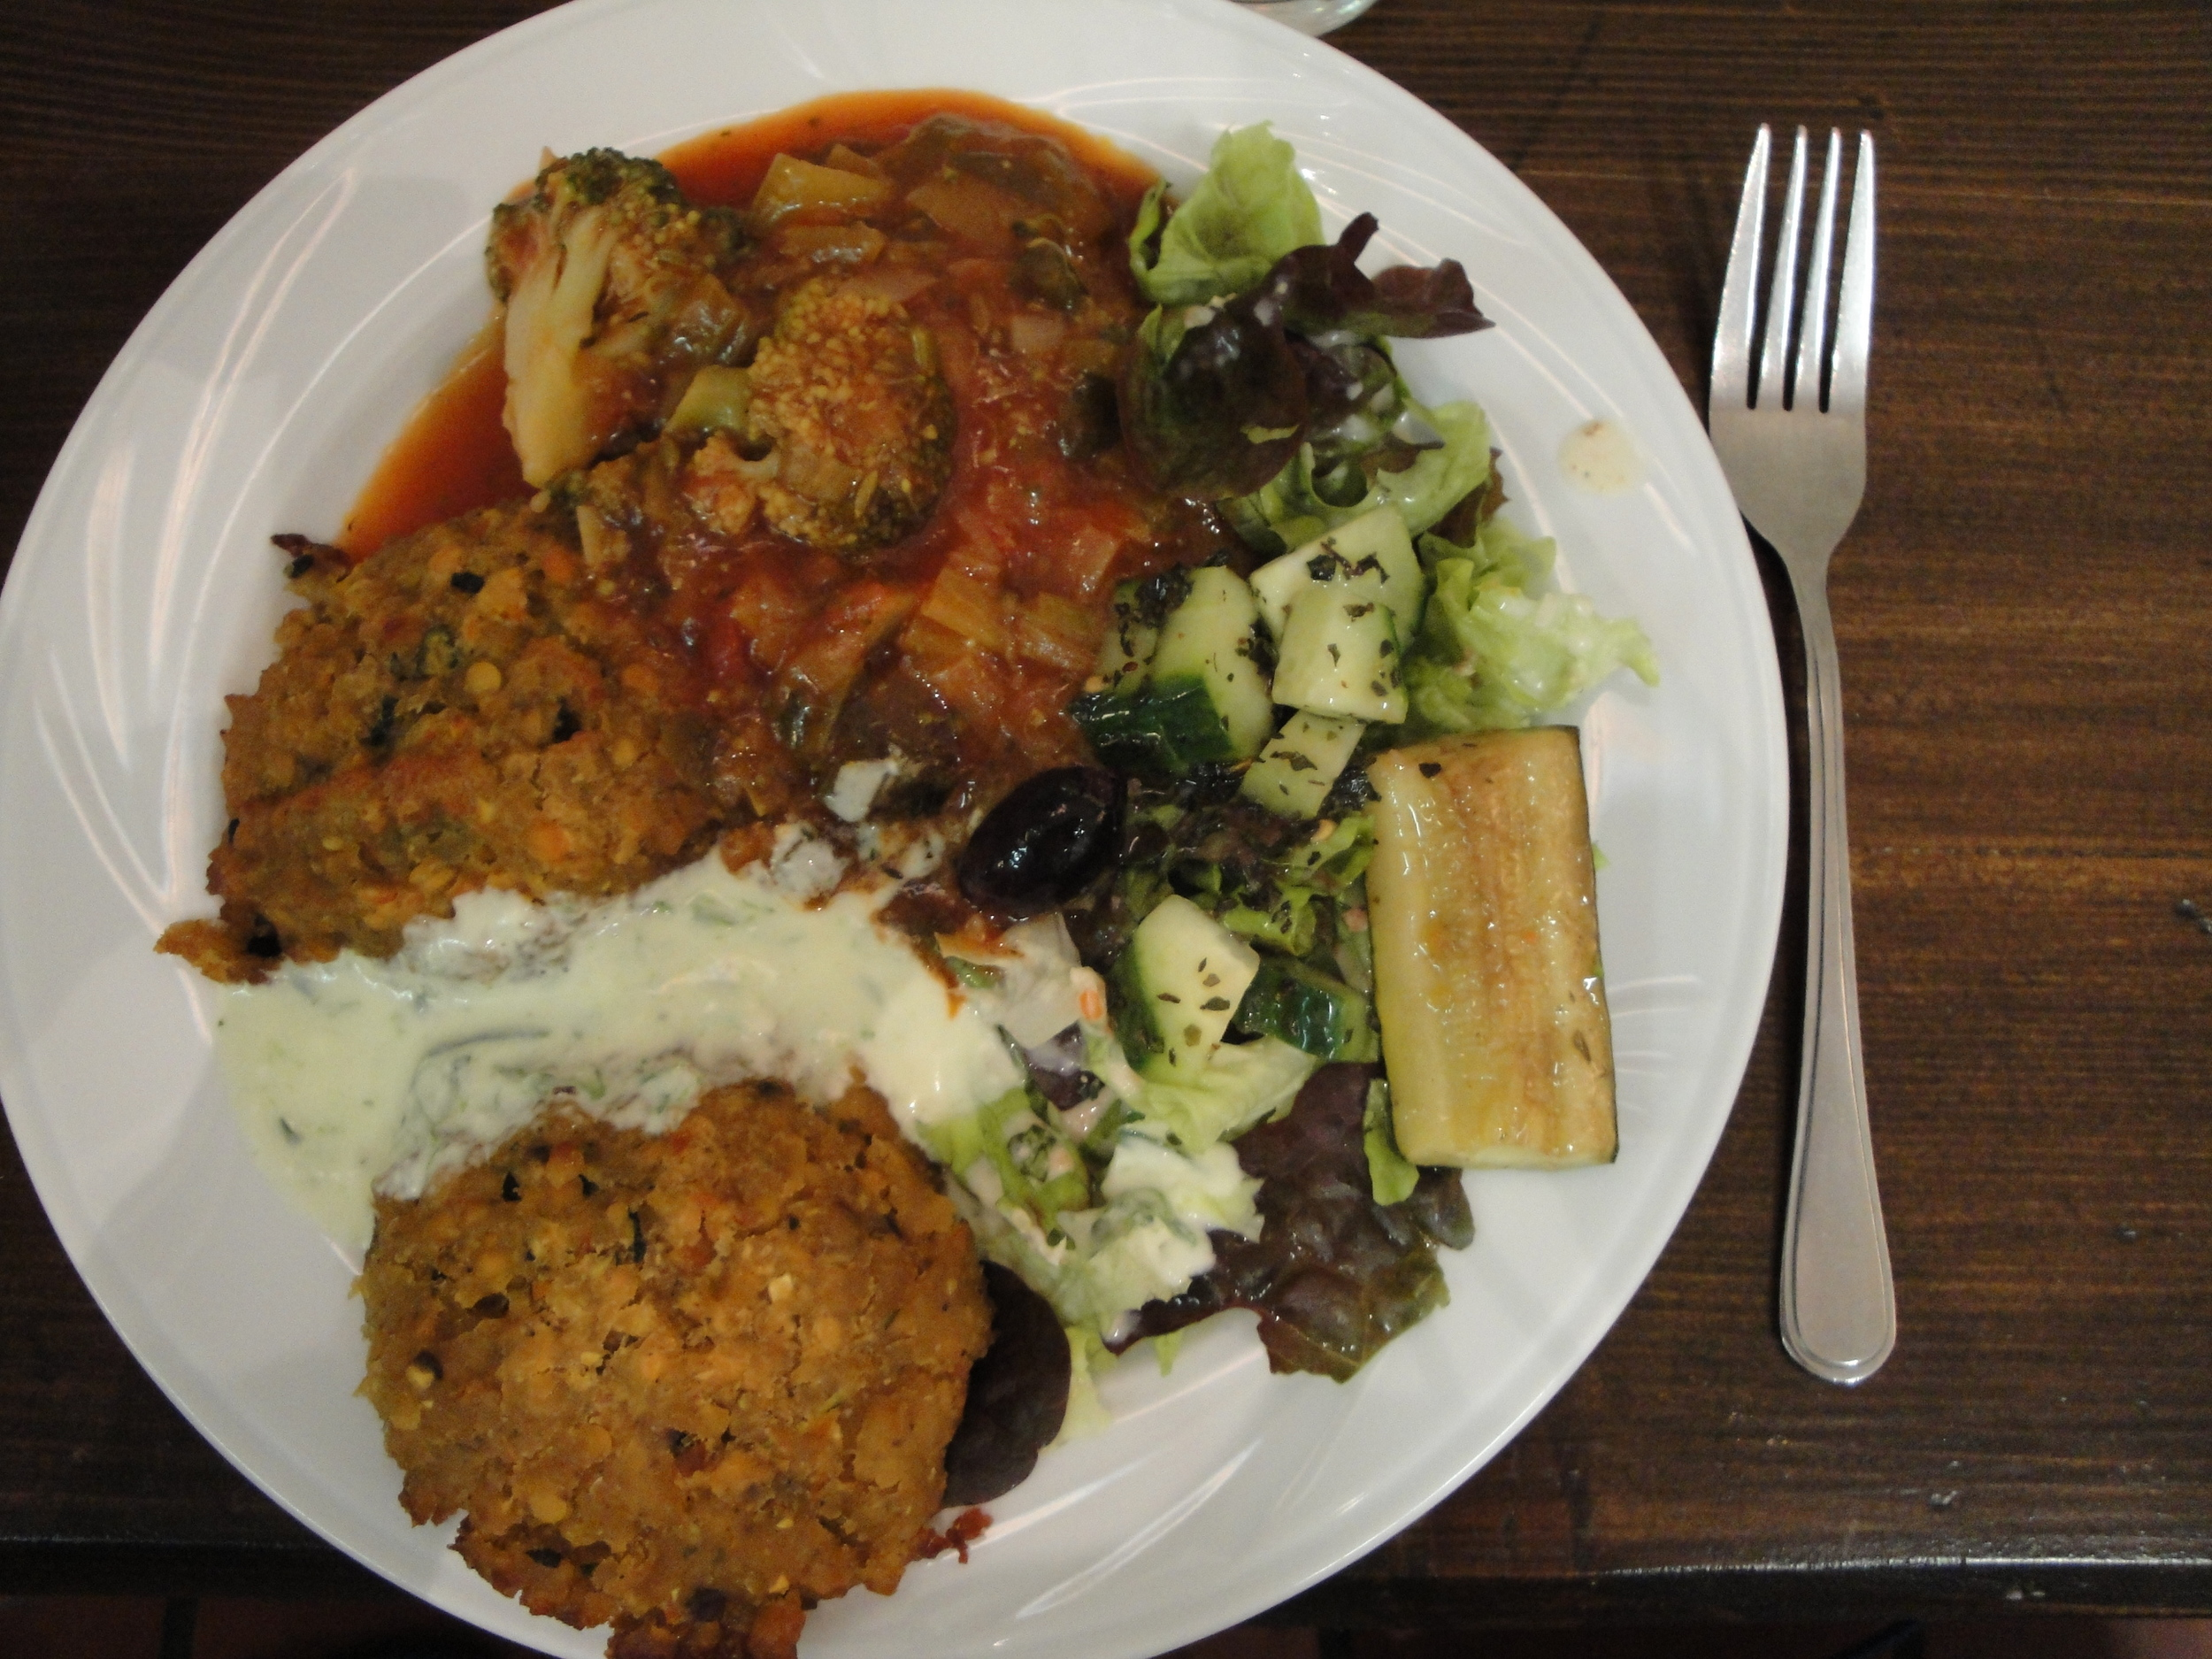 100% organic veg/ vegan lunch.